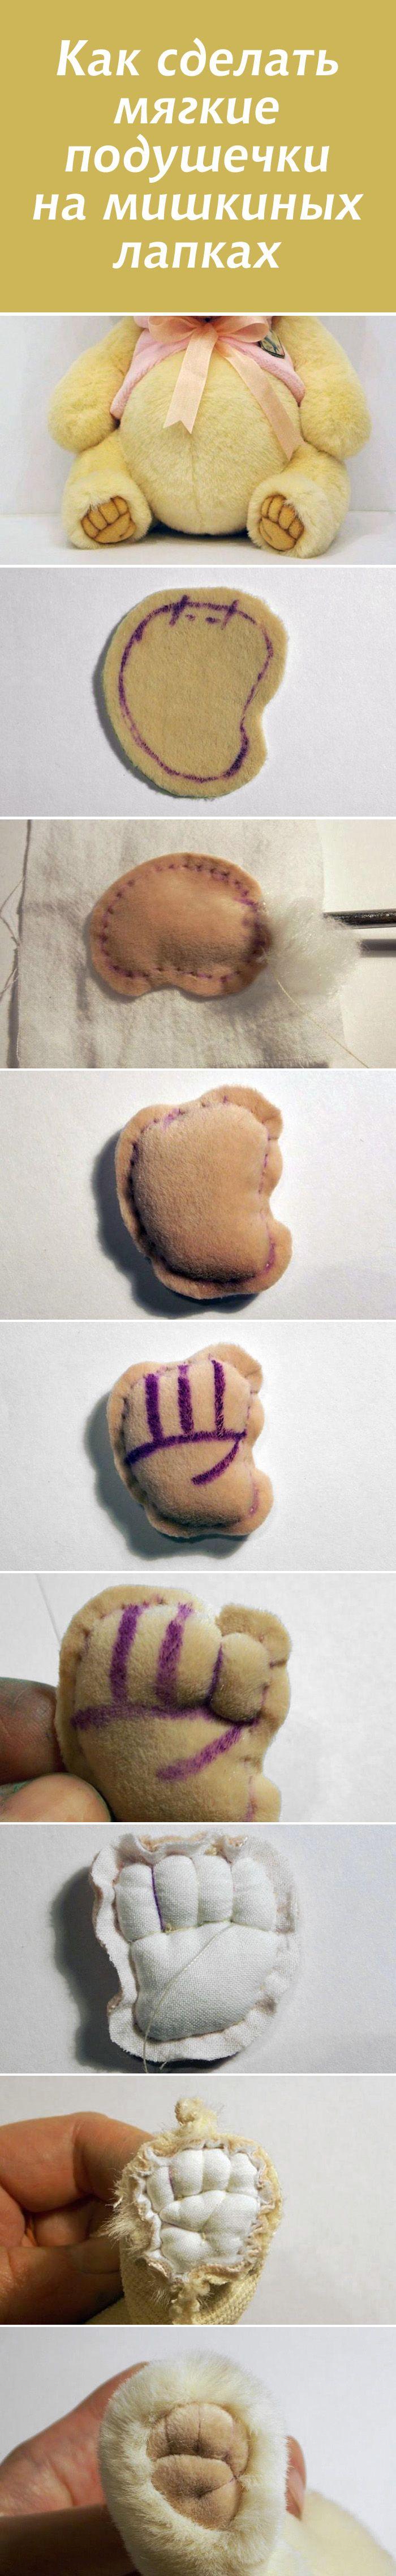 Teddy Bear Padded Paw Pad pattern... Как сделать мягкие подушечки на мишкиных лапках #diy #teddy #teddybear #tutorial